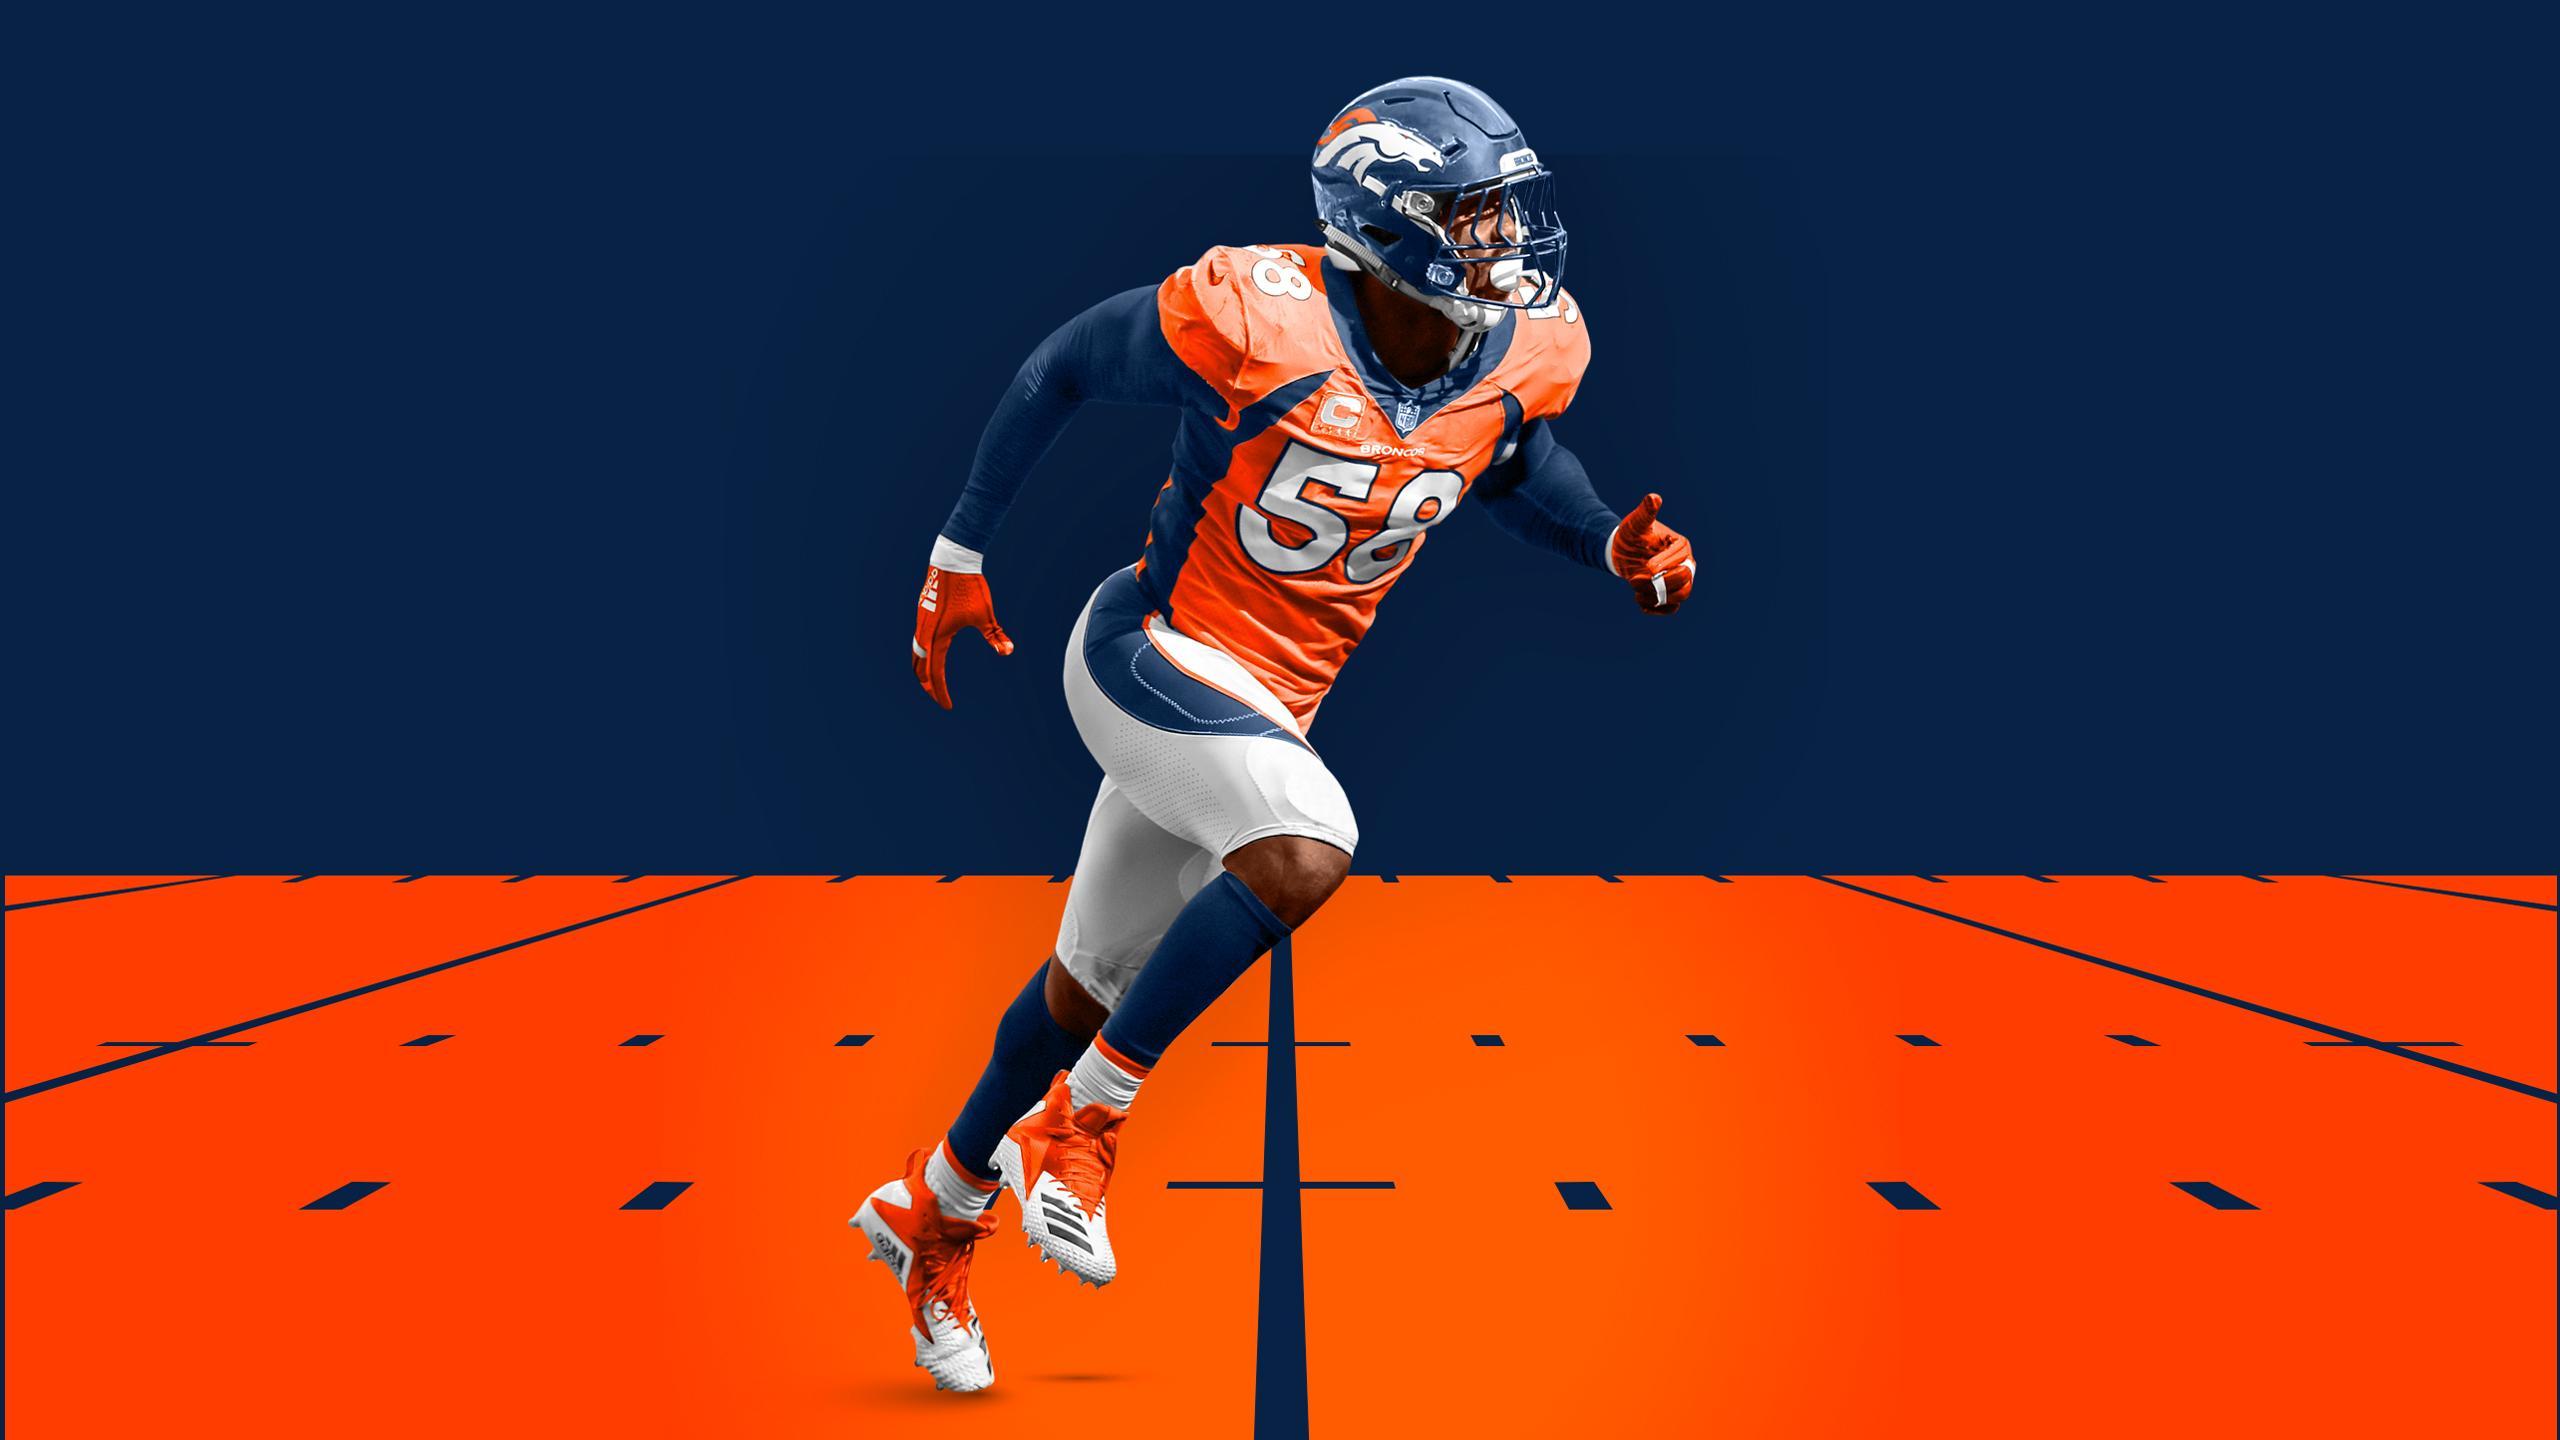 Denver Broncos 2019 Wallpapers - Wallpaper Cave